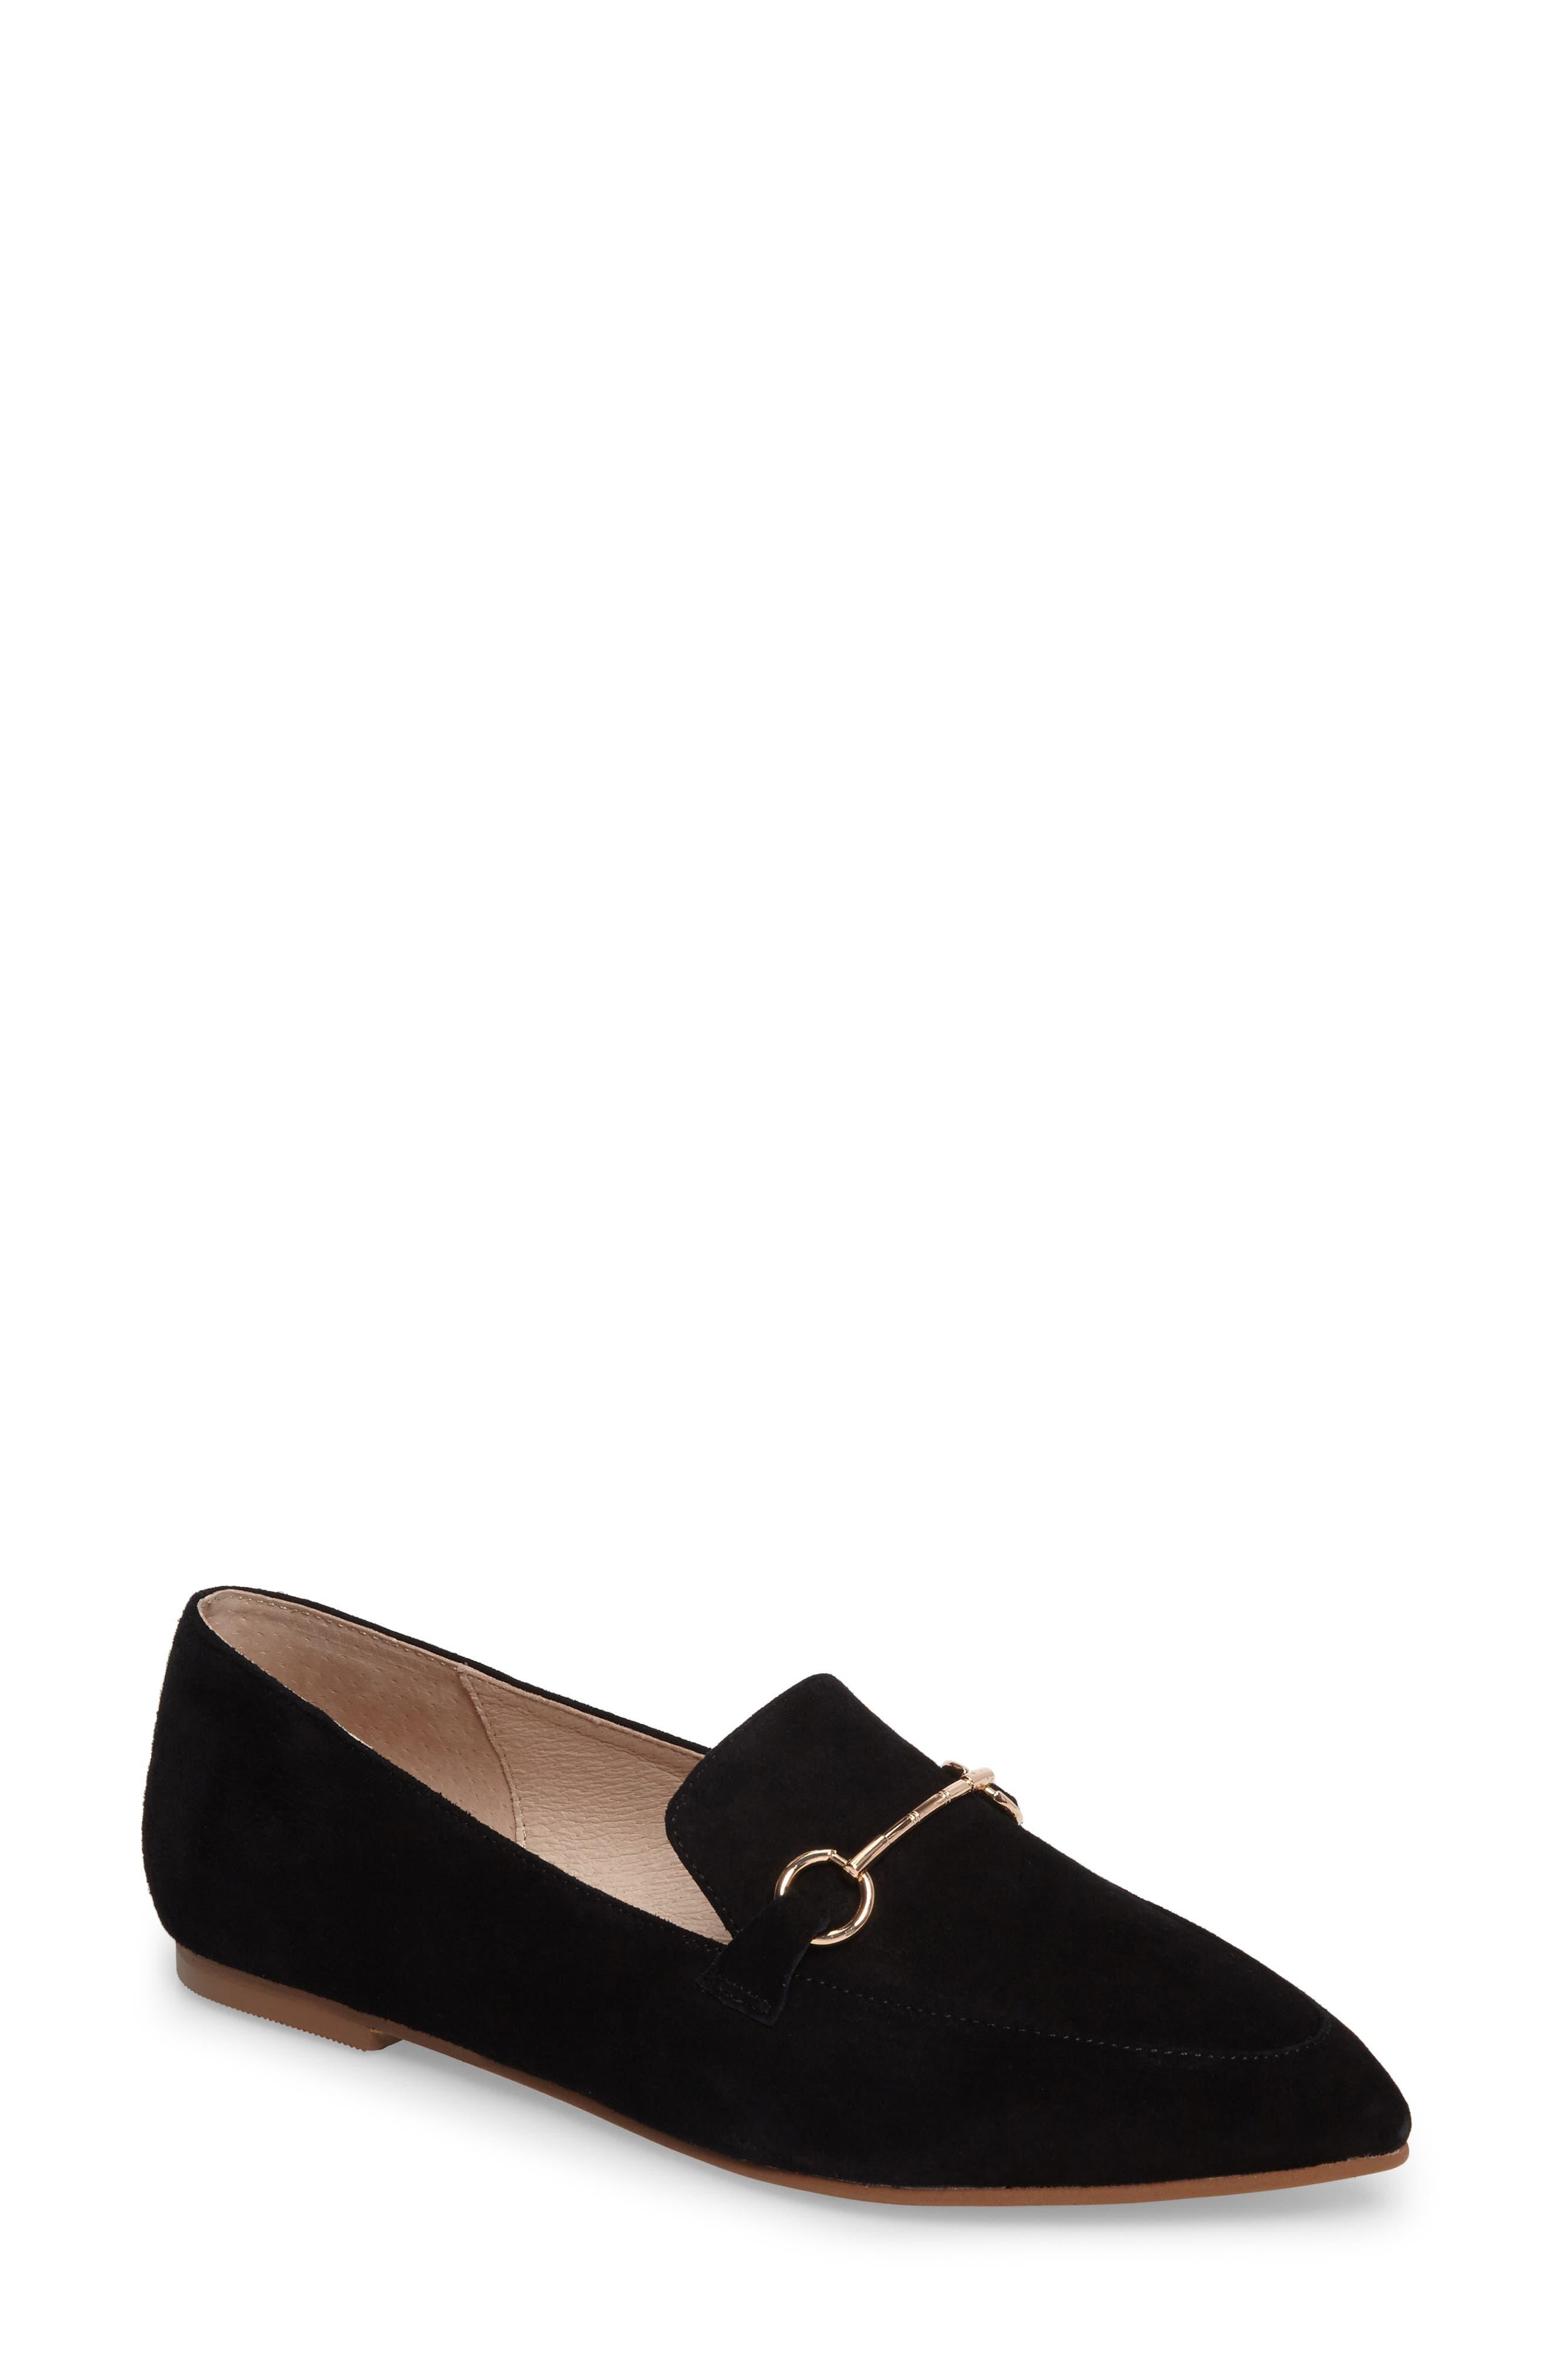 Alternate Image 1 Selected - Kristin Cavallari Cambrie Loafer Flat (Women)